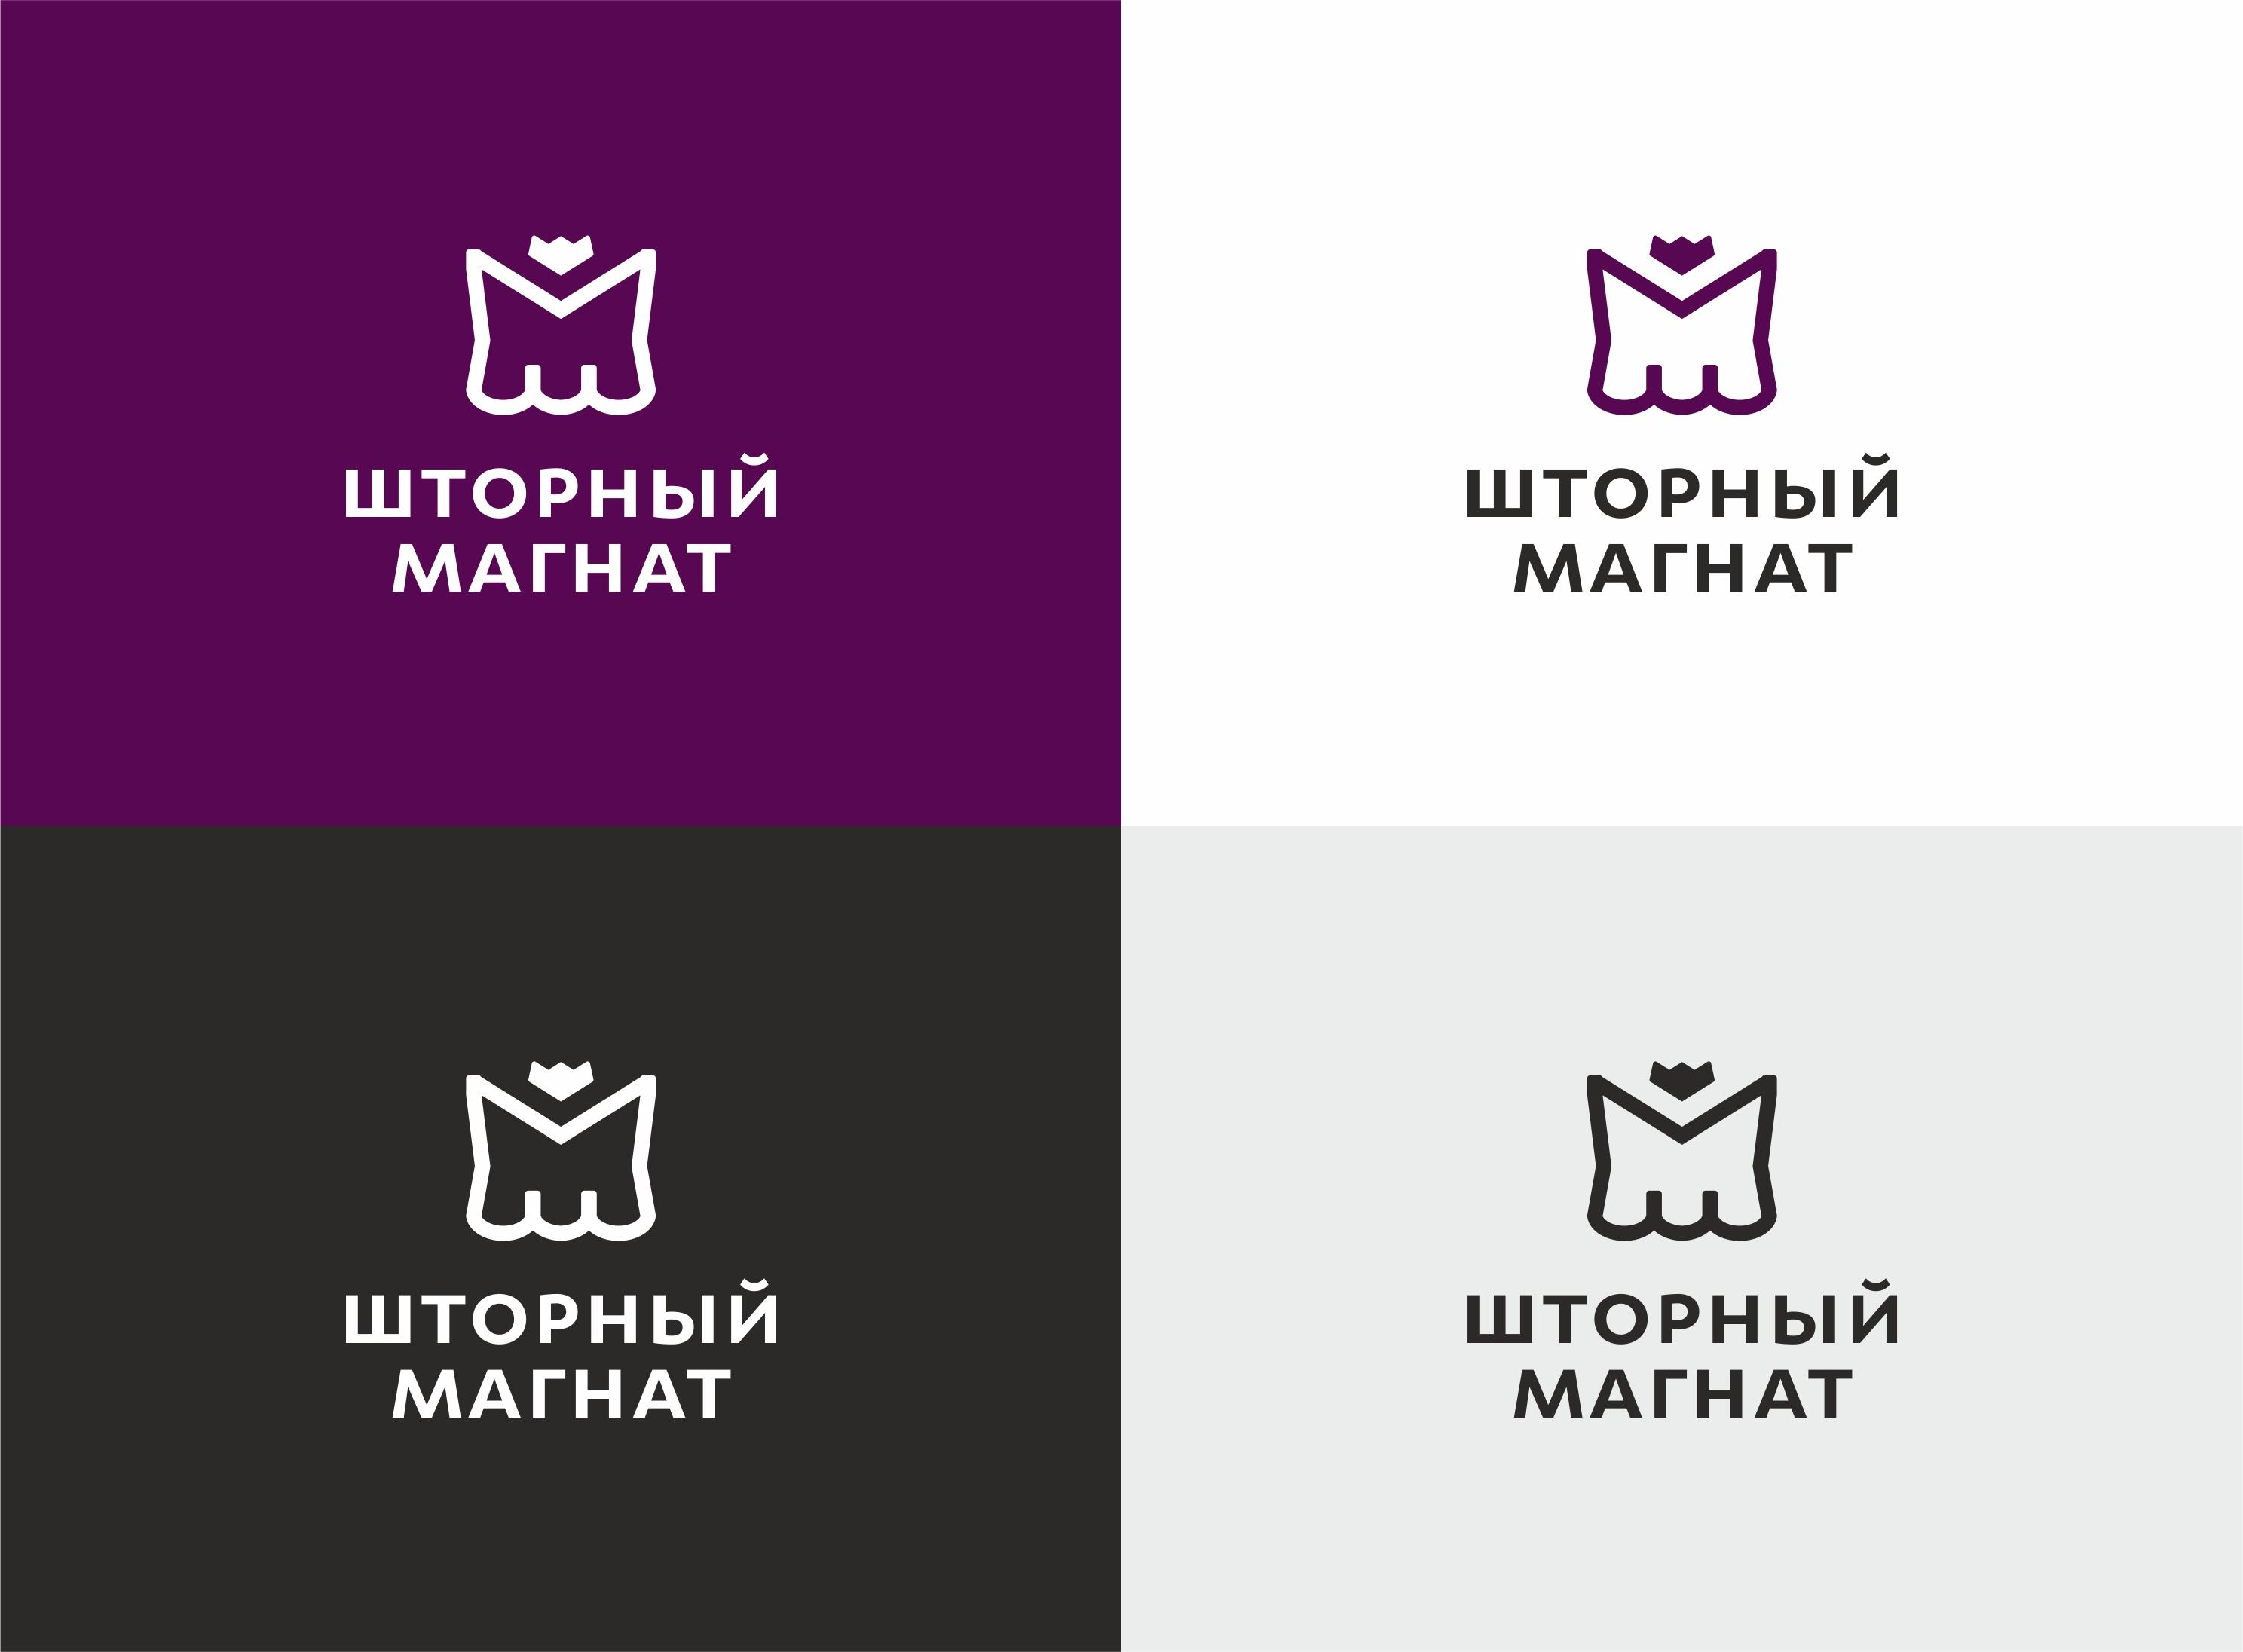 Логотип и фирменный стиль для магазина тканей. фото f_1335cdce210e2eea.jpg